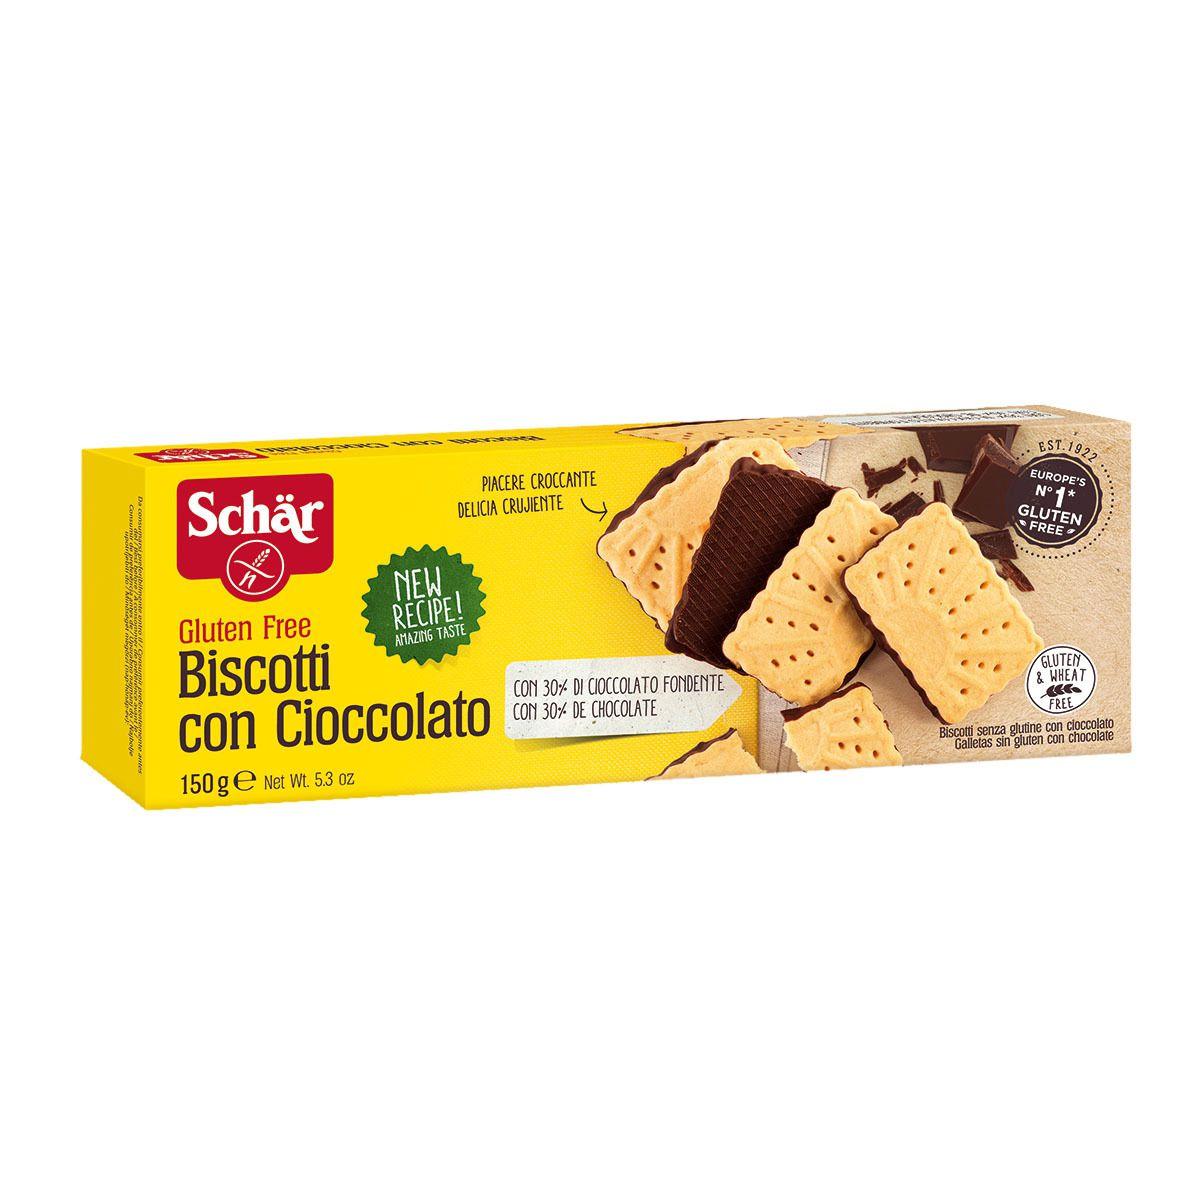 BISCOITO COM CHOCOLATE SEM GLUTEN SCHAR - 150G